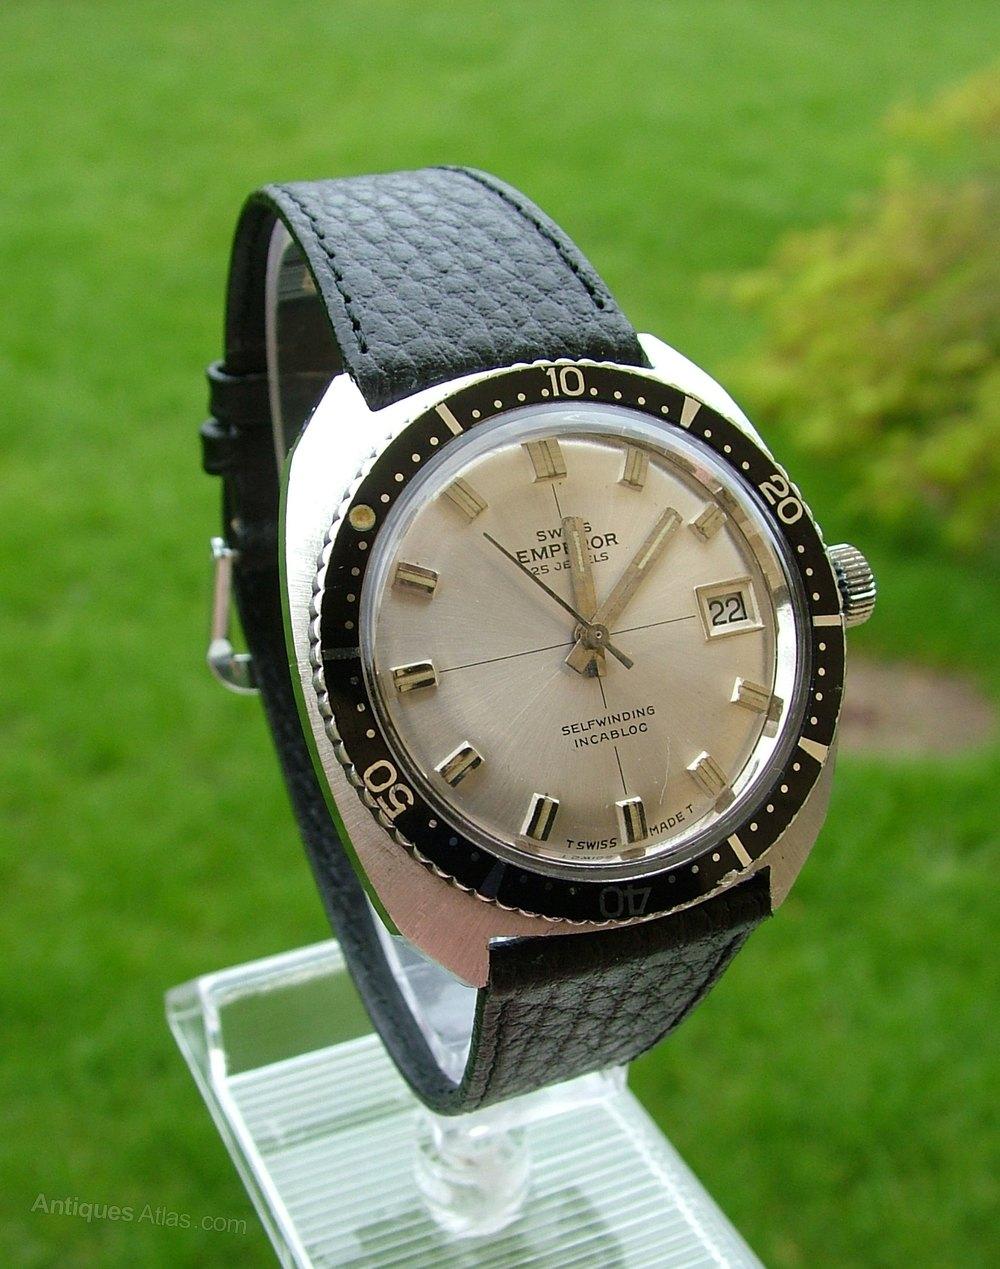 a4b22729a9d Antiques Atlas - A Gents 1960s Swiss Emperor Automatic Wrist Watch